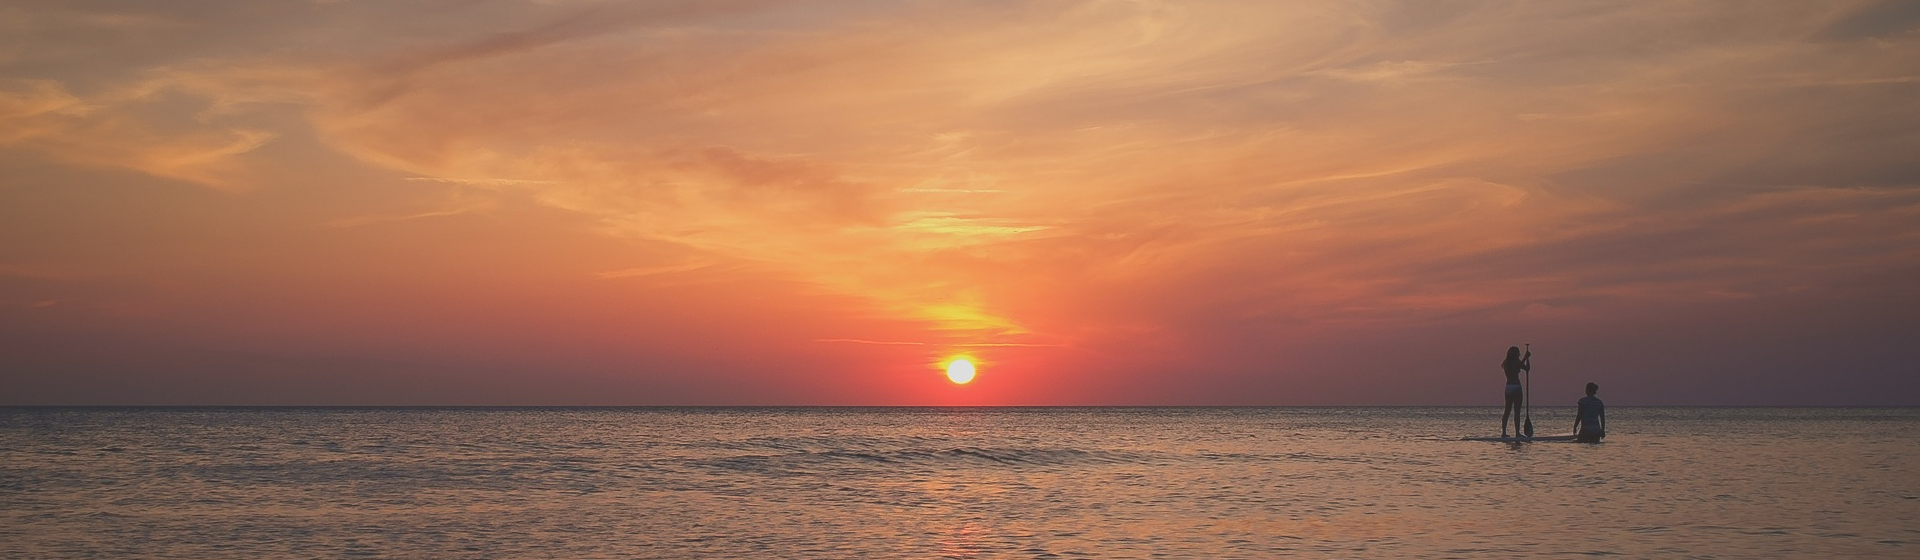 Sunset over Hawaii beach